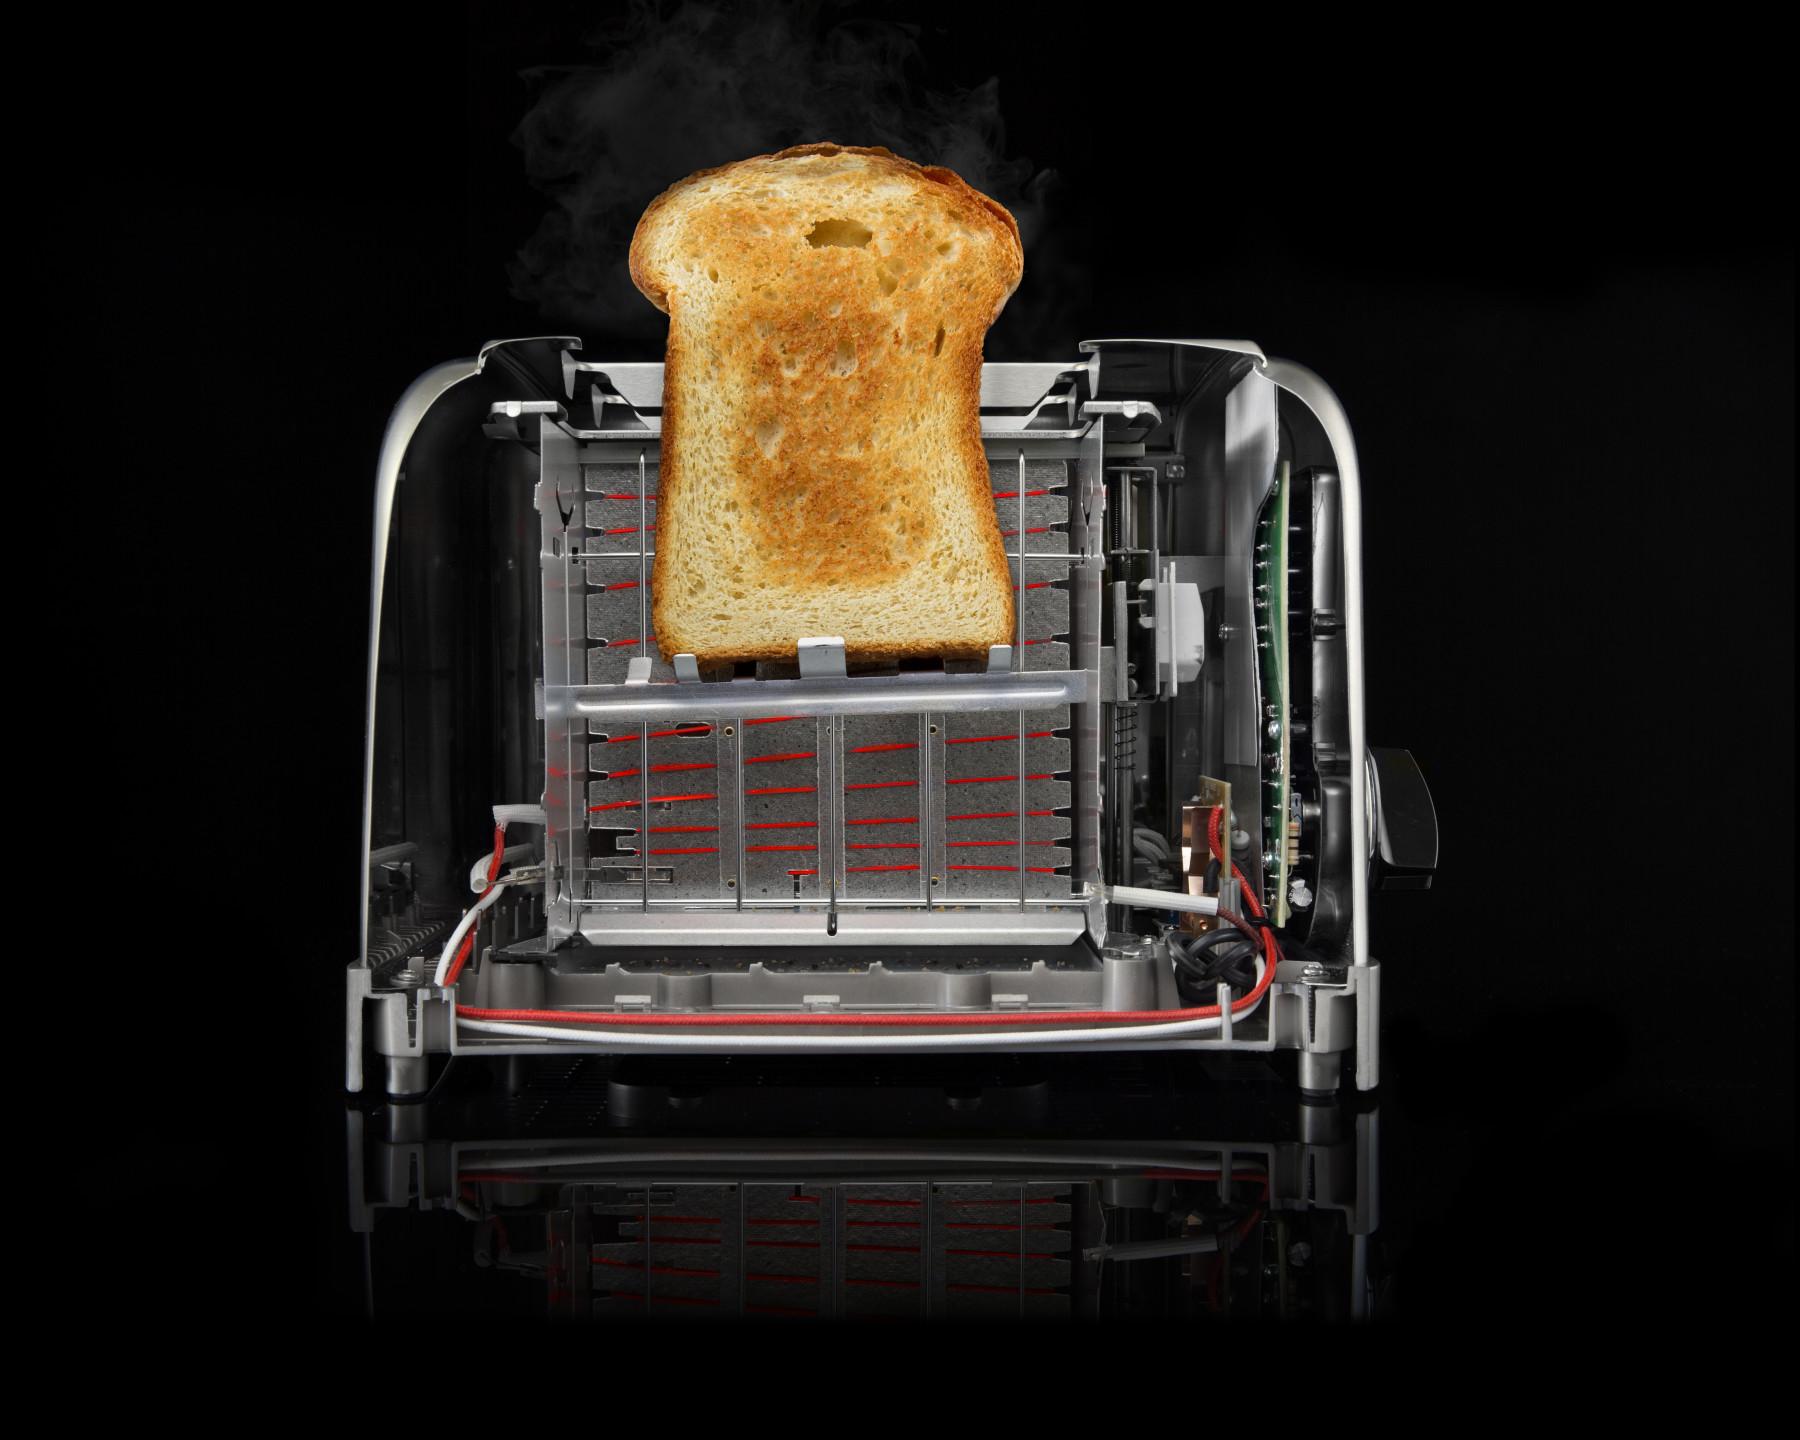 Toaster Cutaway_Toast V2_EDIT_29333